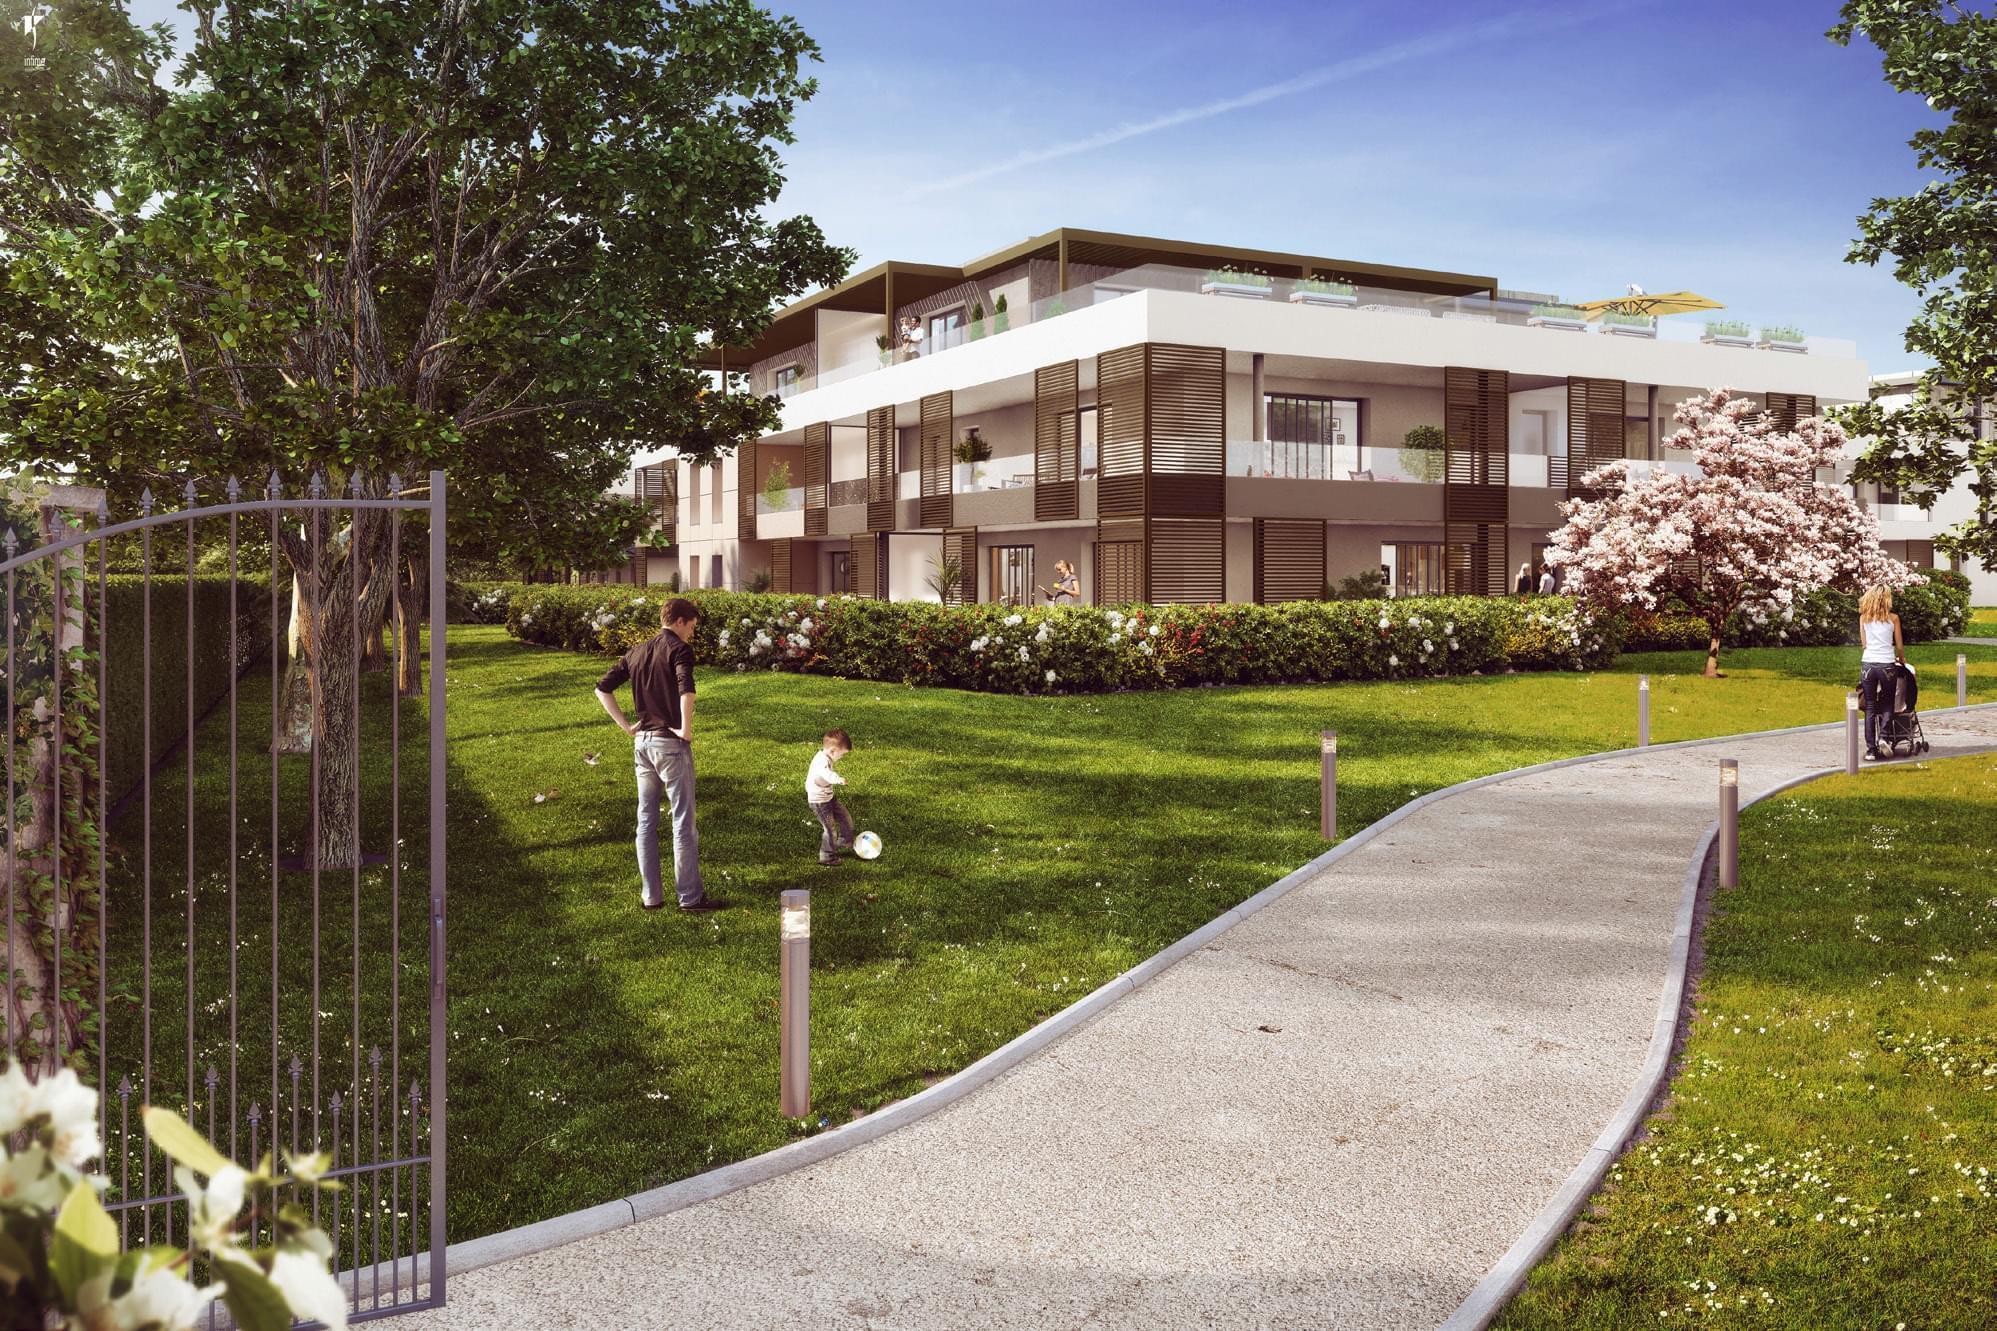 Immobilier neuf proche annemasse acheter pour louer for Acheter garage pour louer